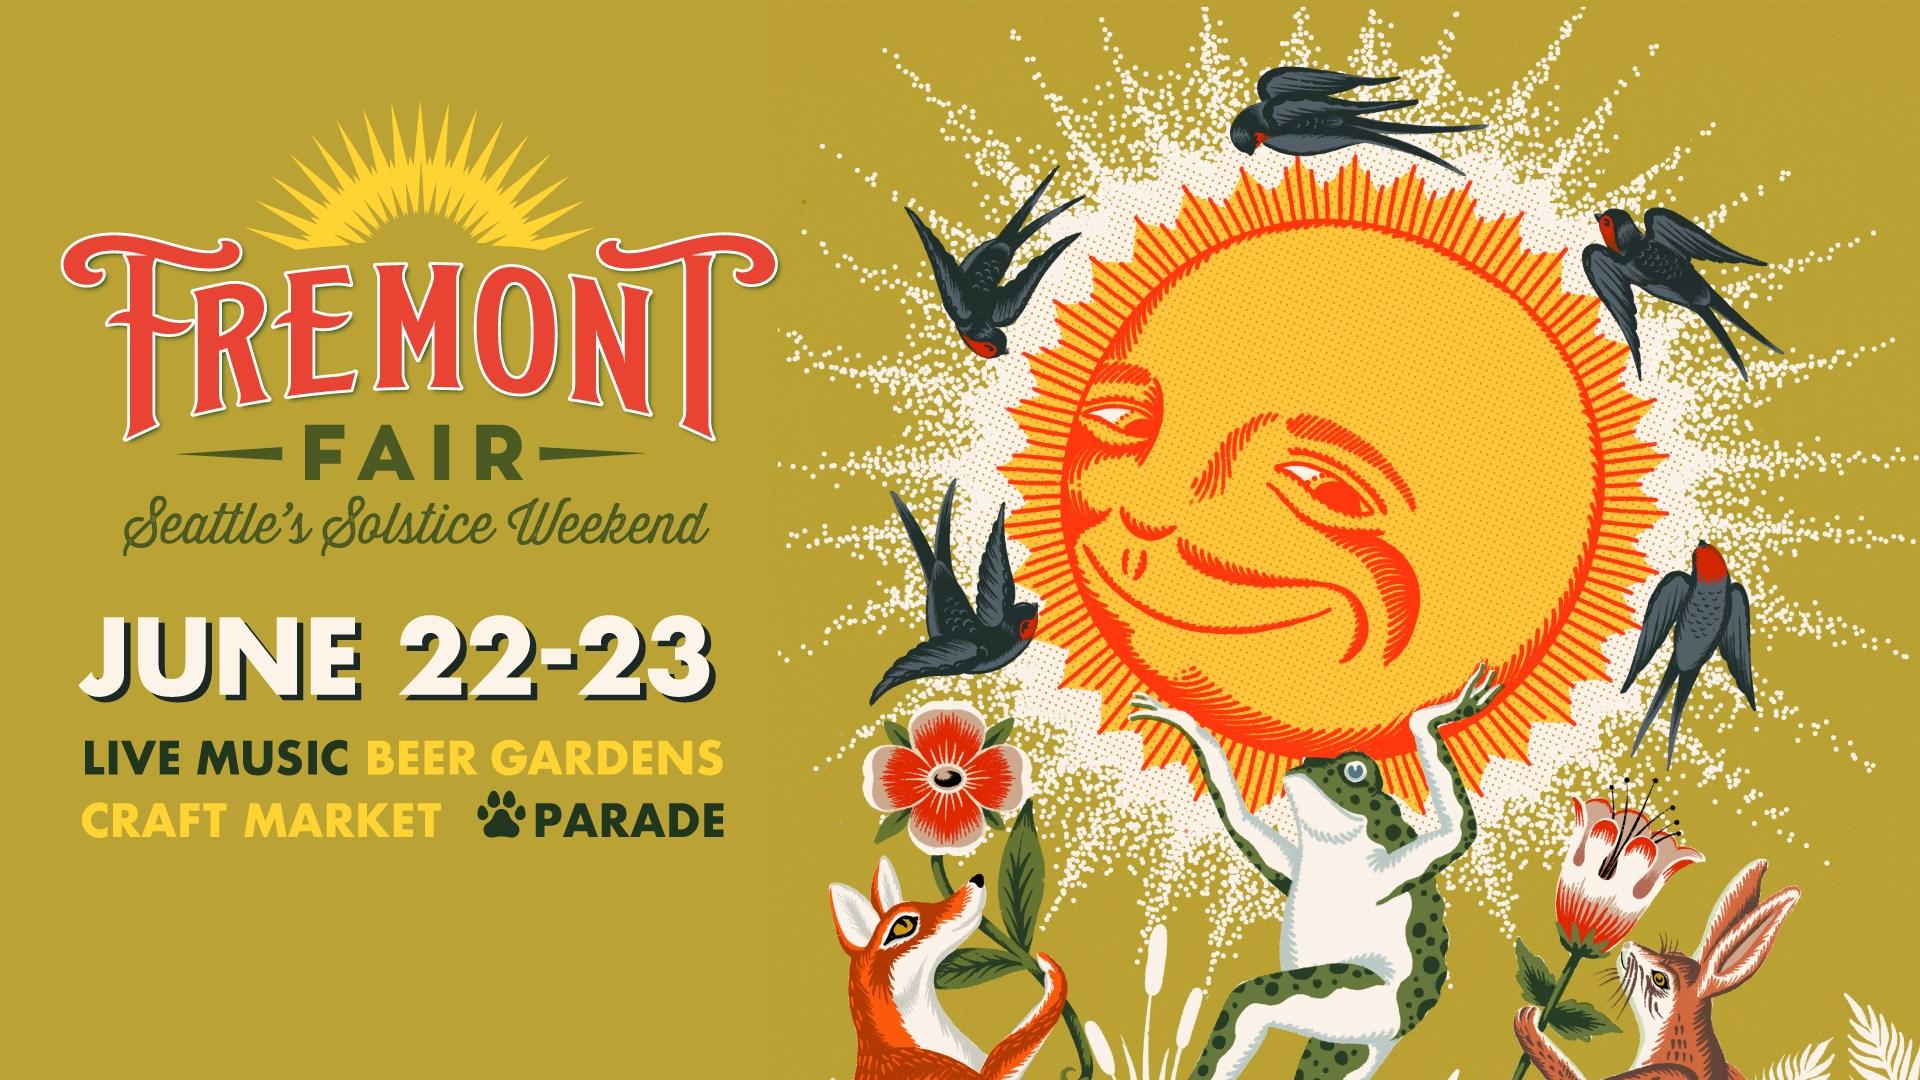 Fremont Fair Seattle's Solstice Weekend